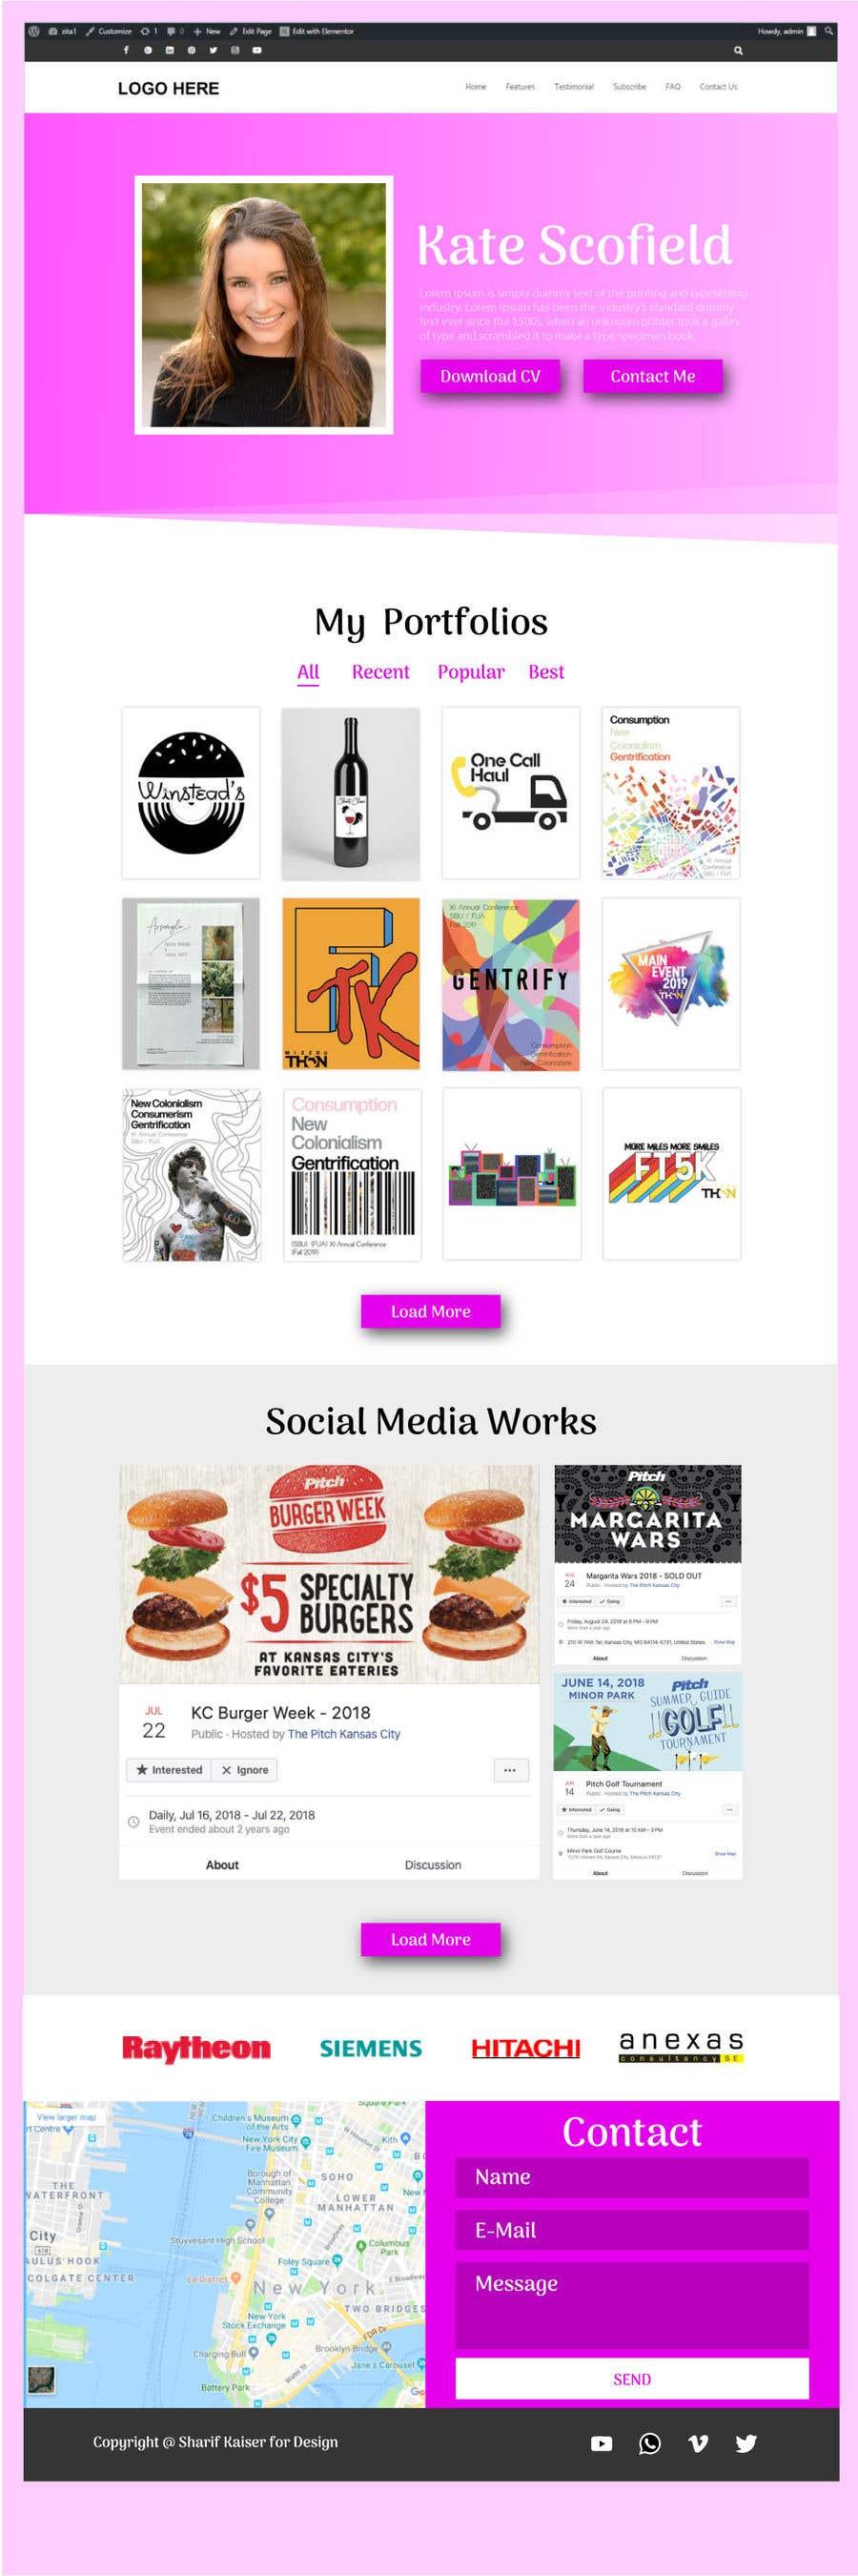 Kilpailutyö #                                        13                                      kilpailussa                                         Redesign Pinterest UI/UX Homepage/Profile page